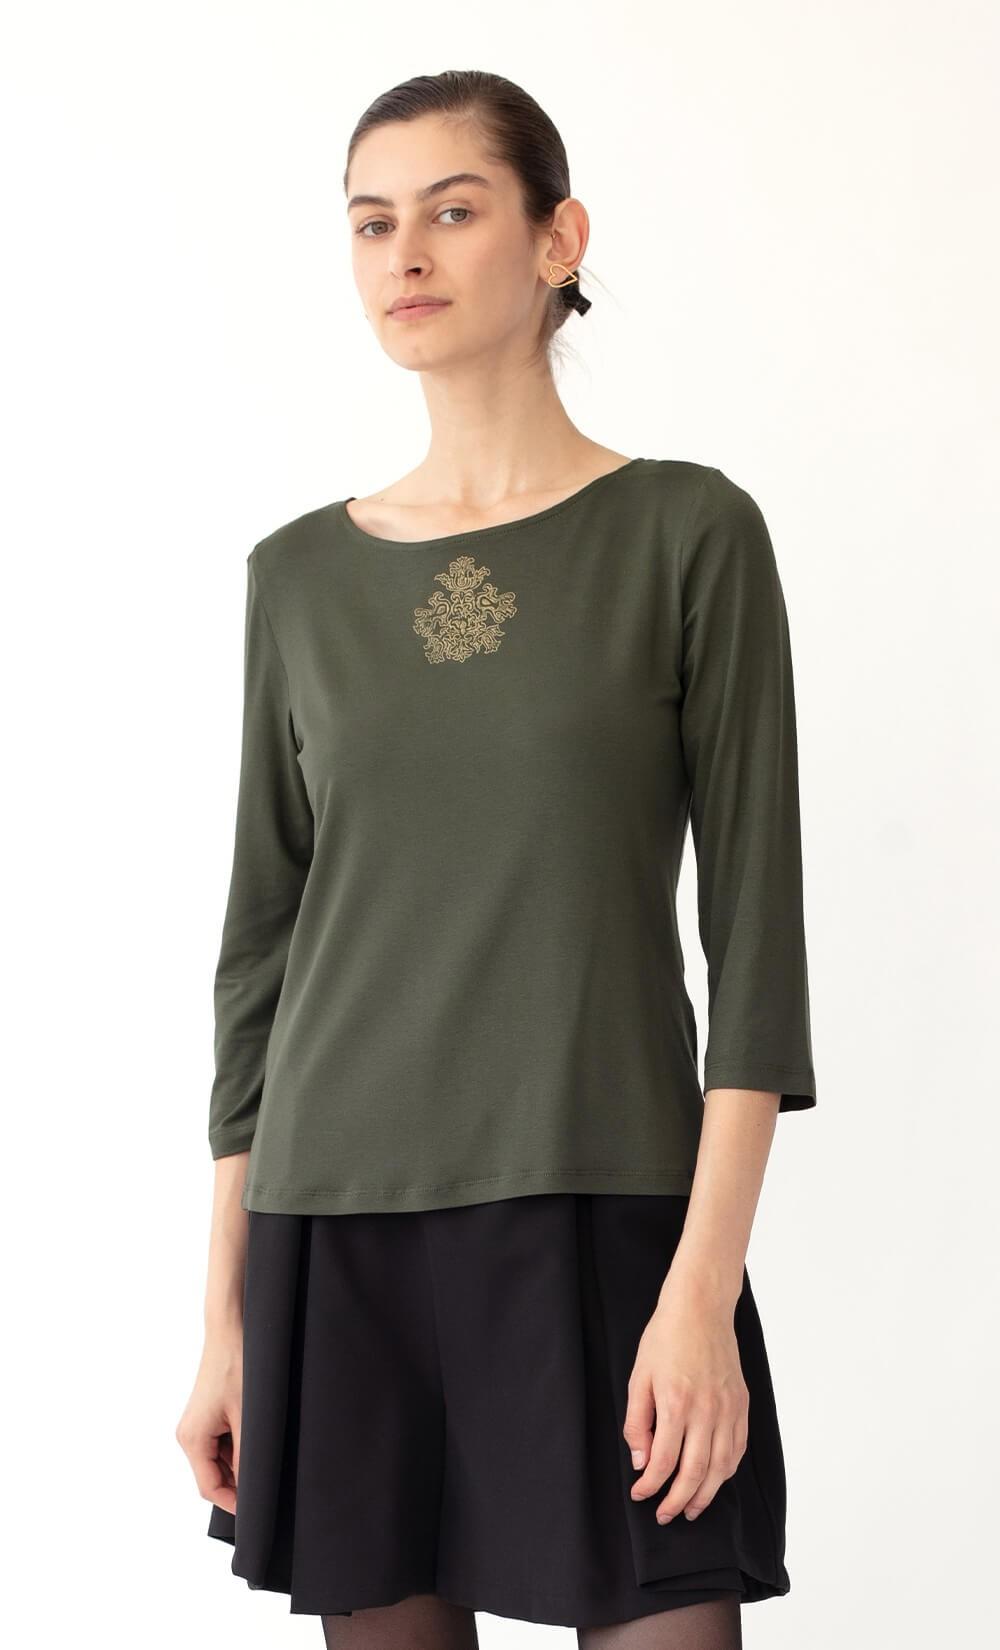 Folly Medallion Olive Green T-Shirt